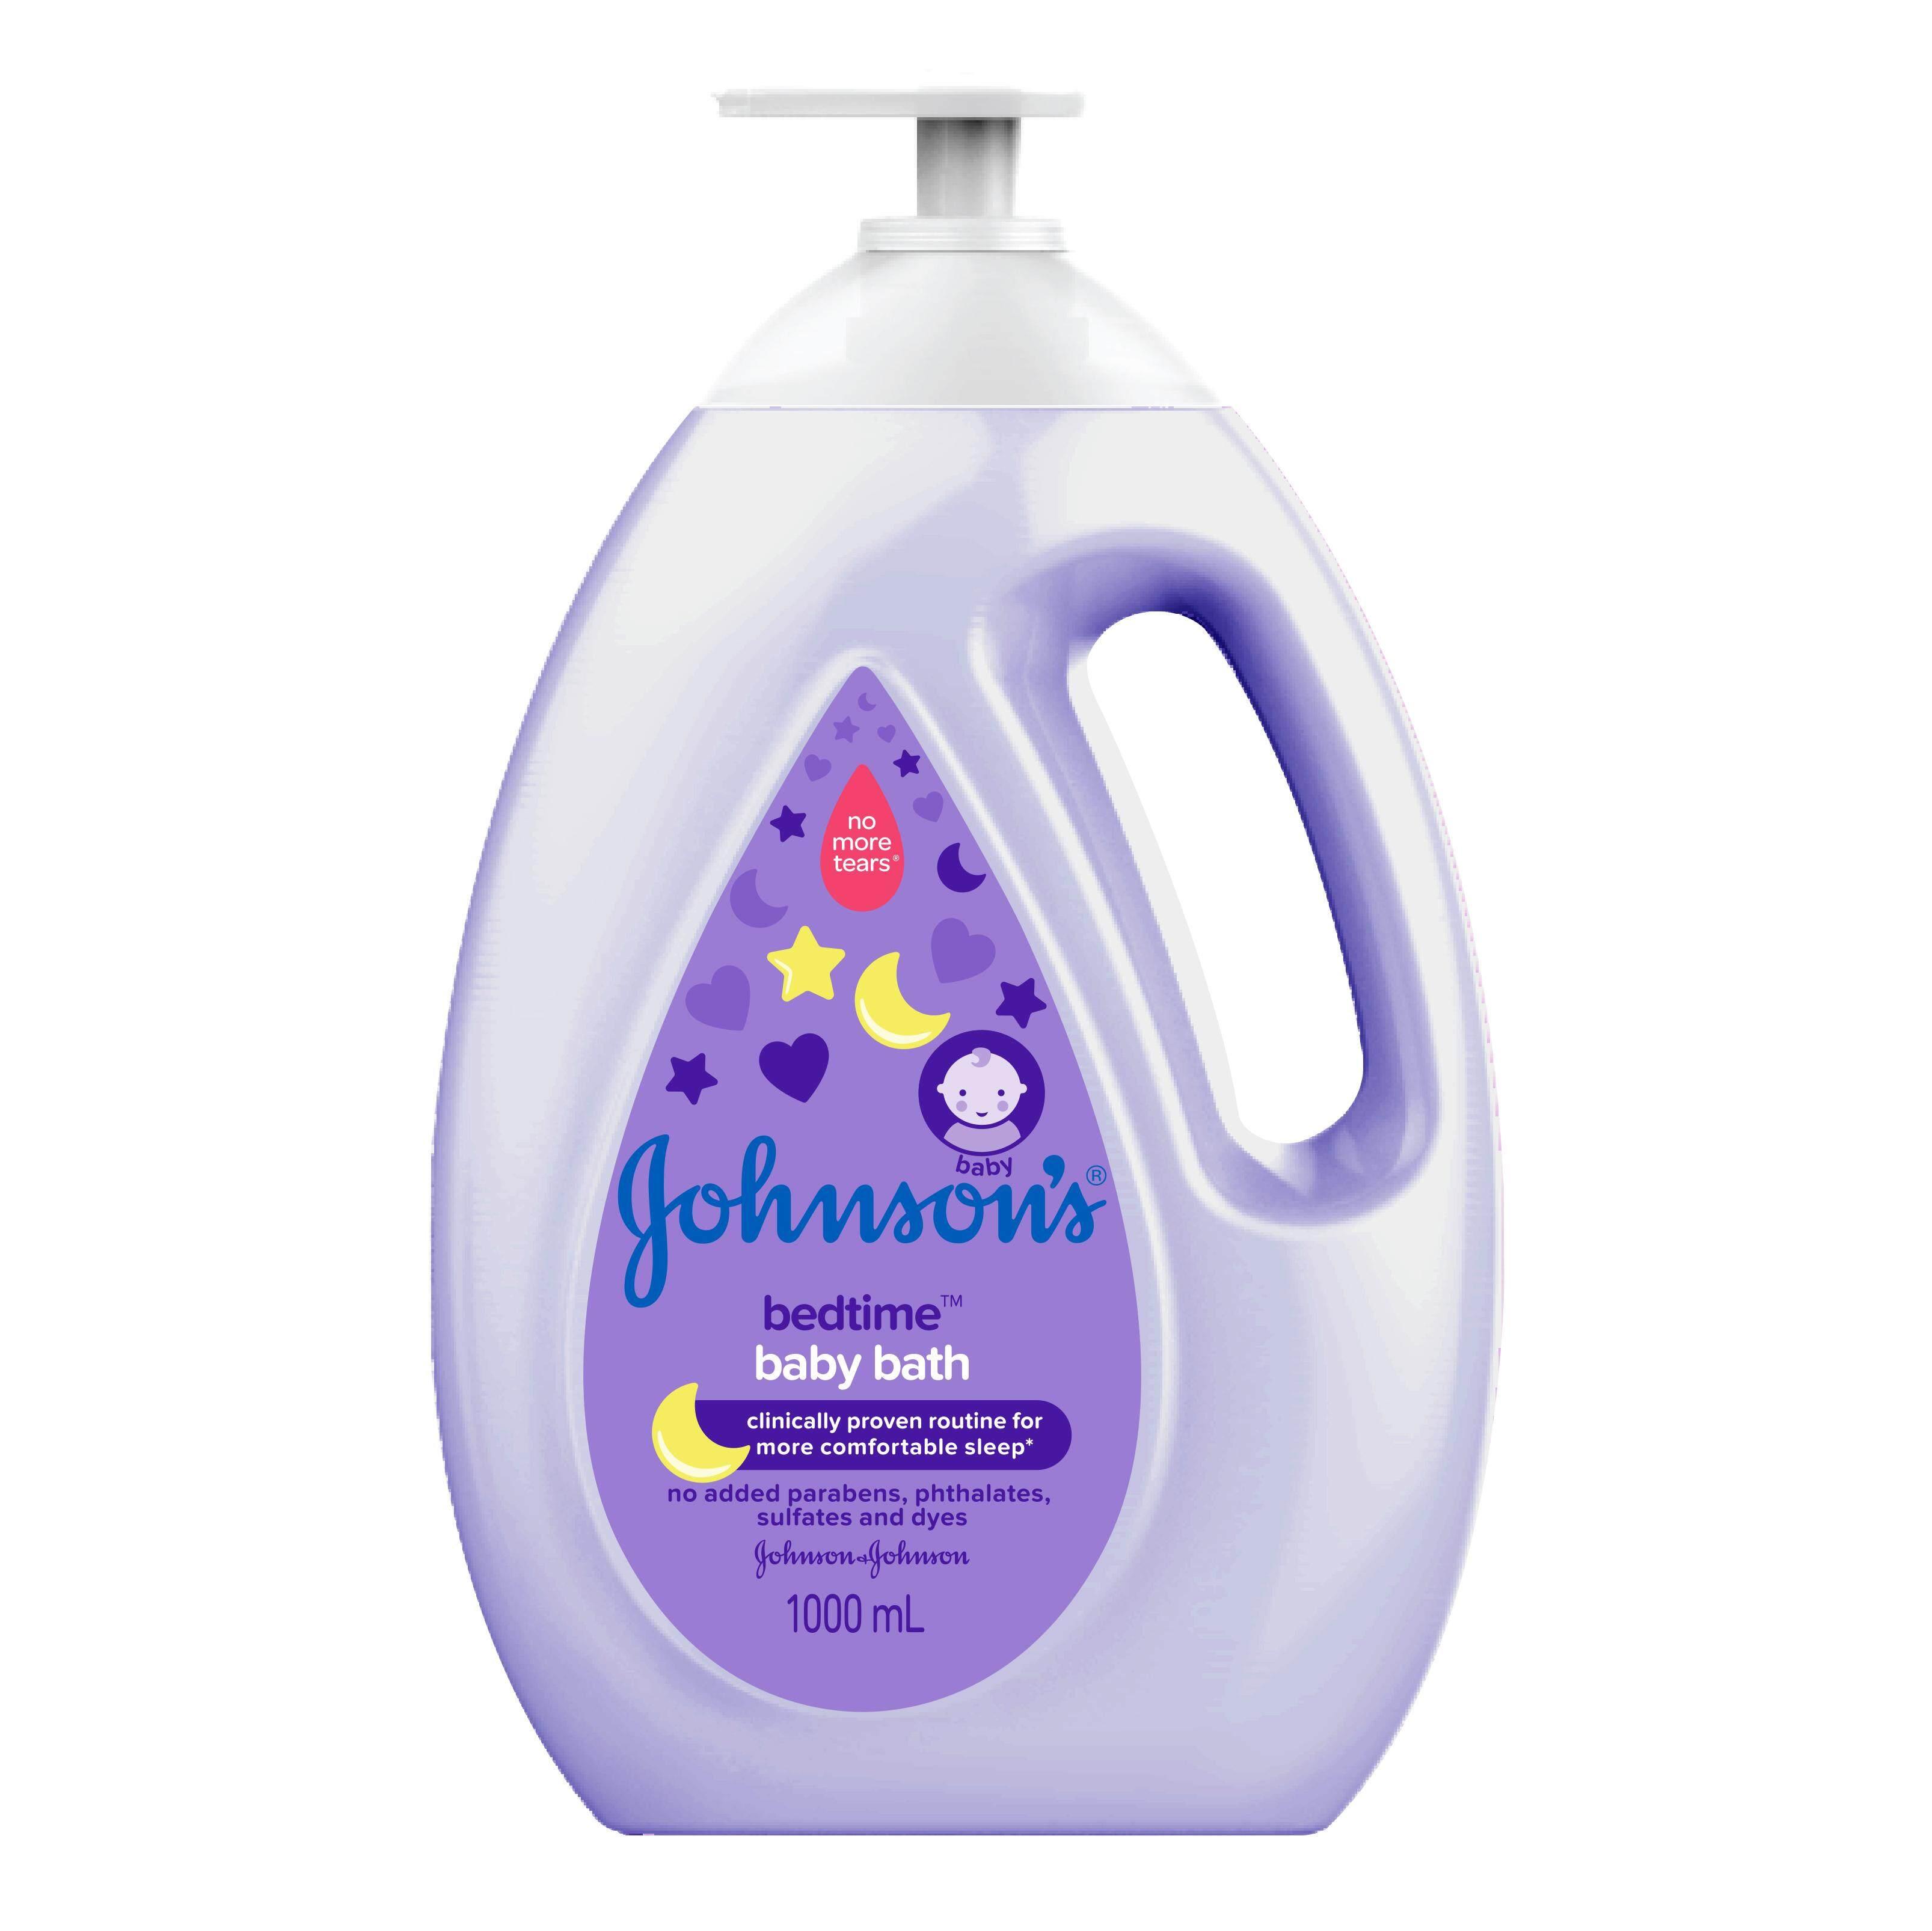 Johnson's Baby Bedtime Bath 1000ml